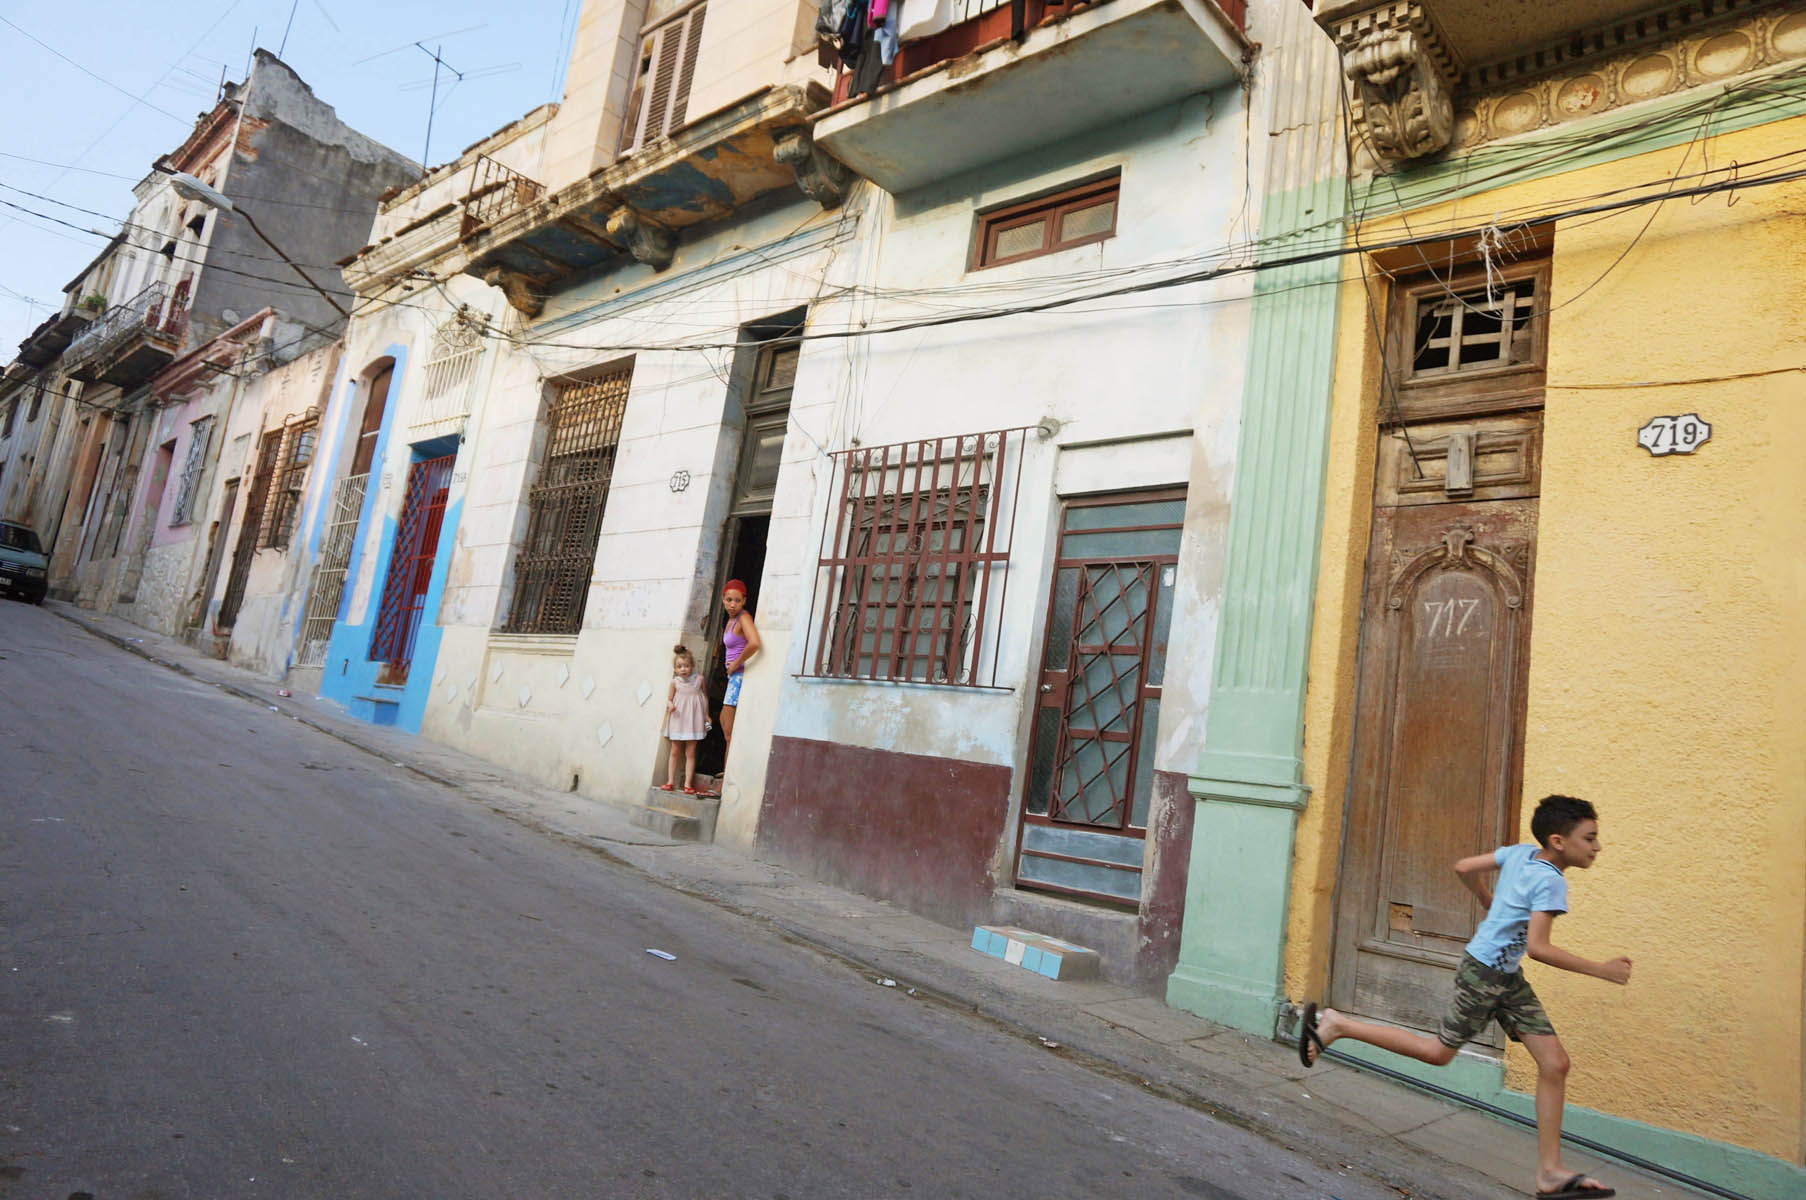 Running Boy, Habana Centro